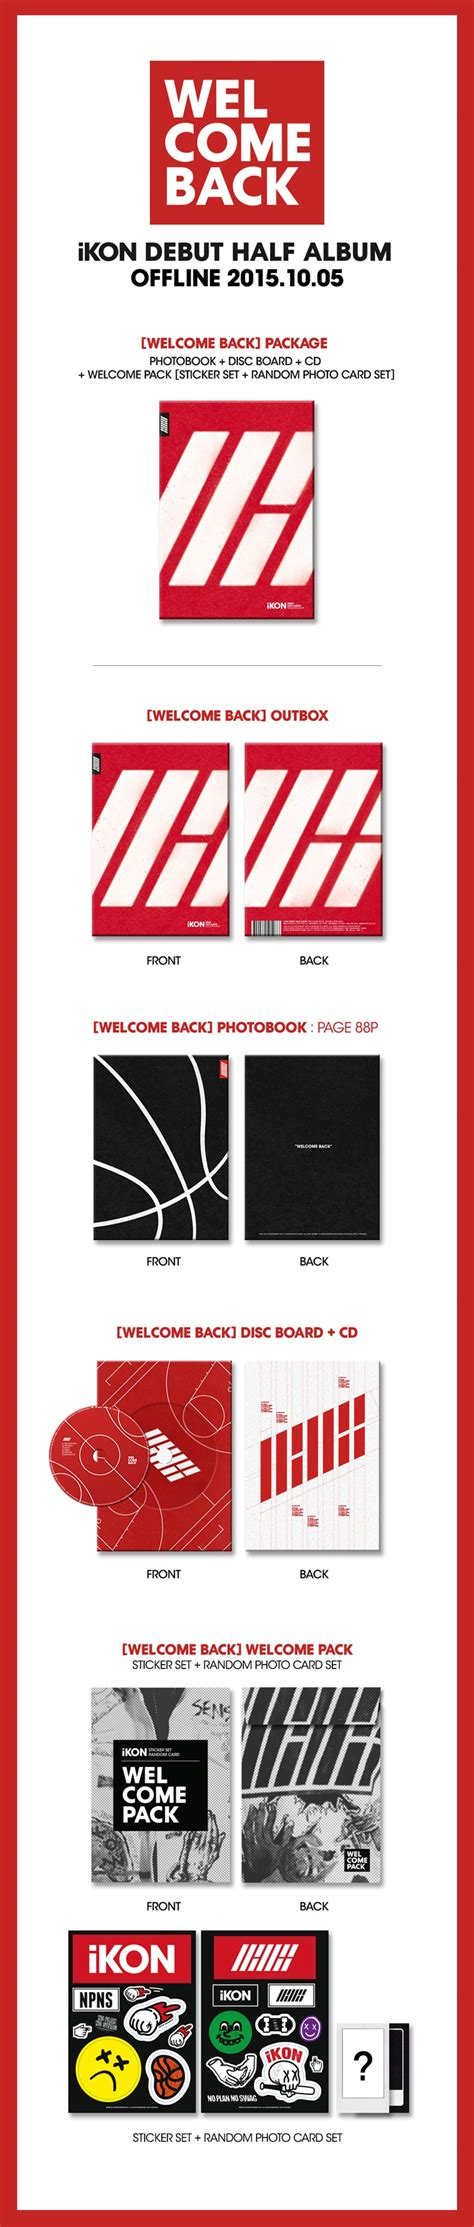 Ikon Welcome Back Debut Half Album ikon debut half album welcome back